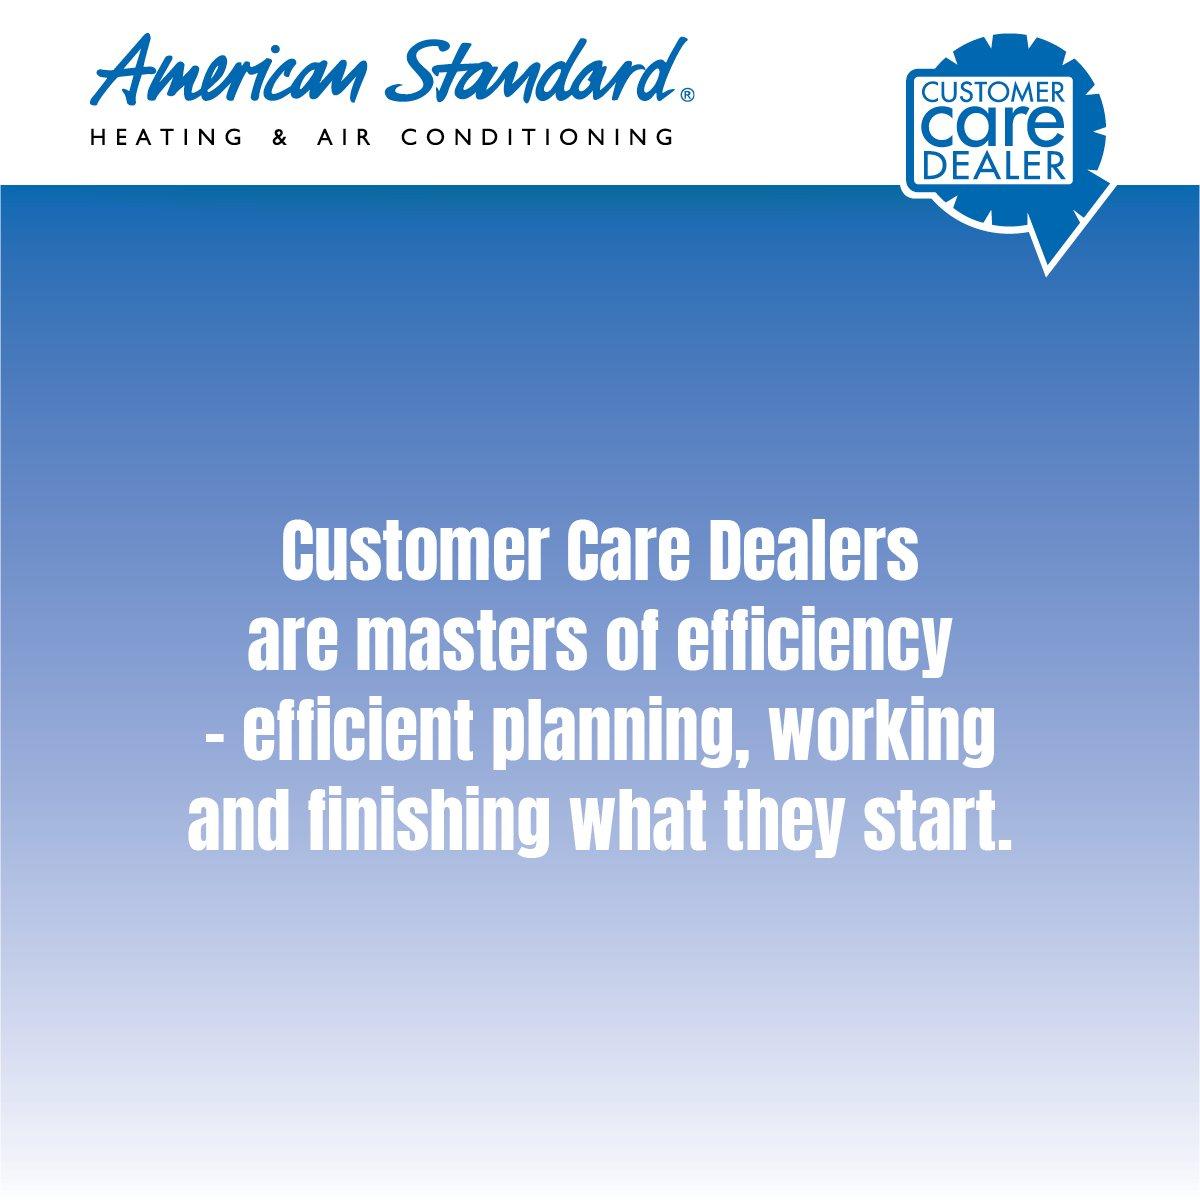 ASD Customer Care (@CCDealer) | Twitter